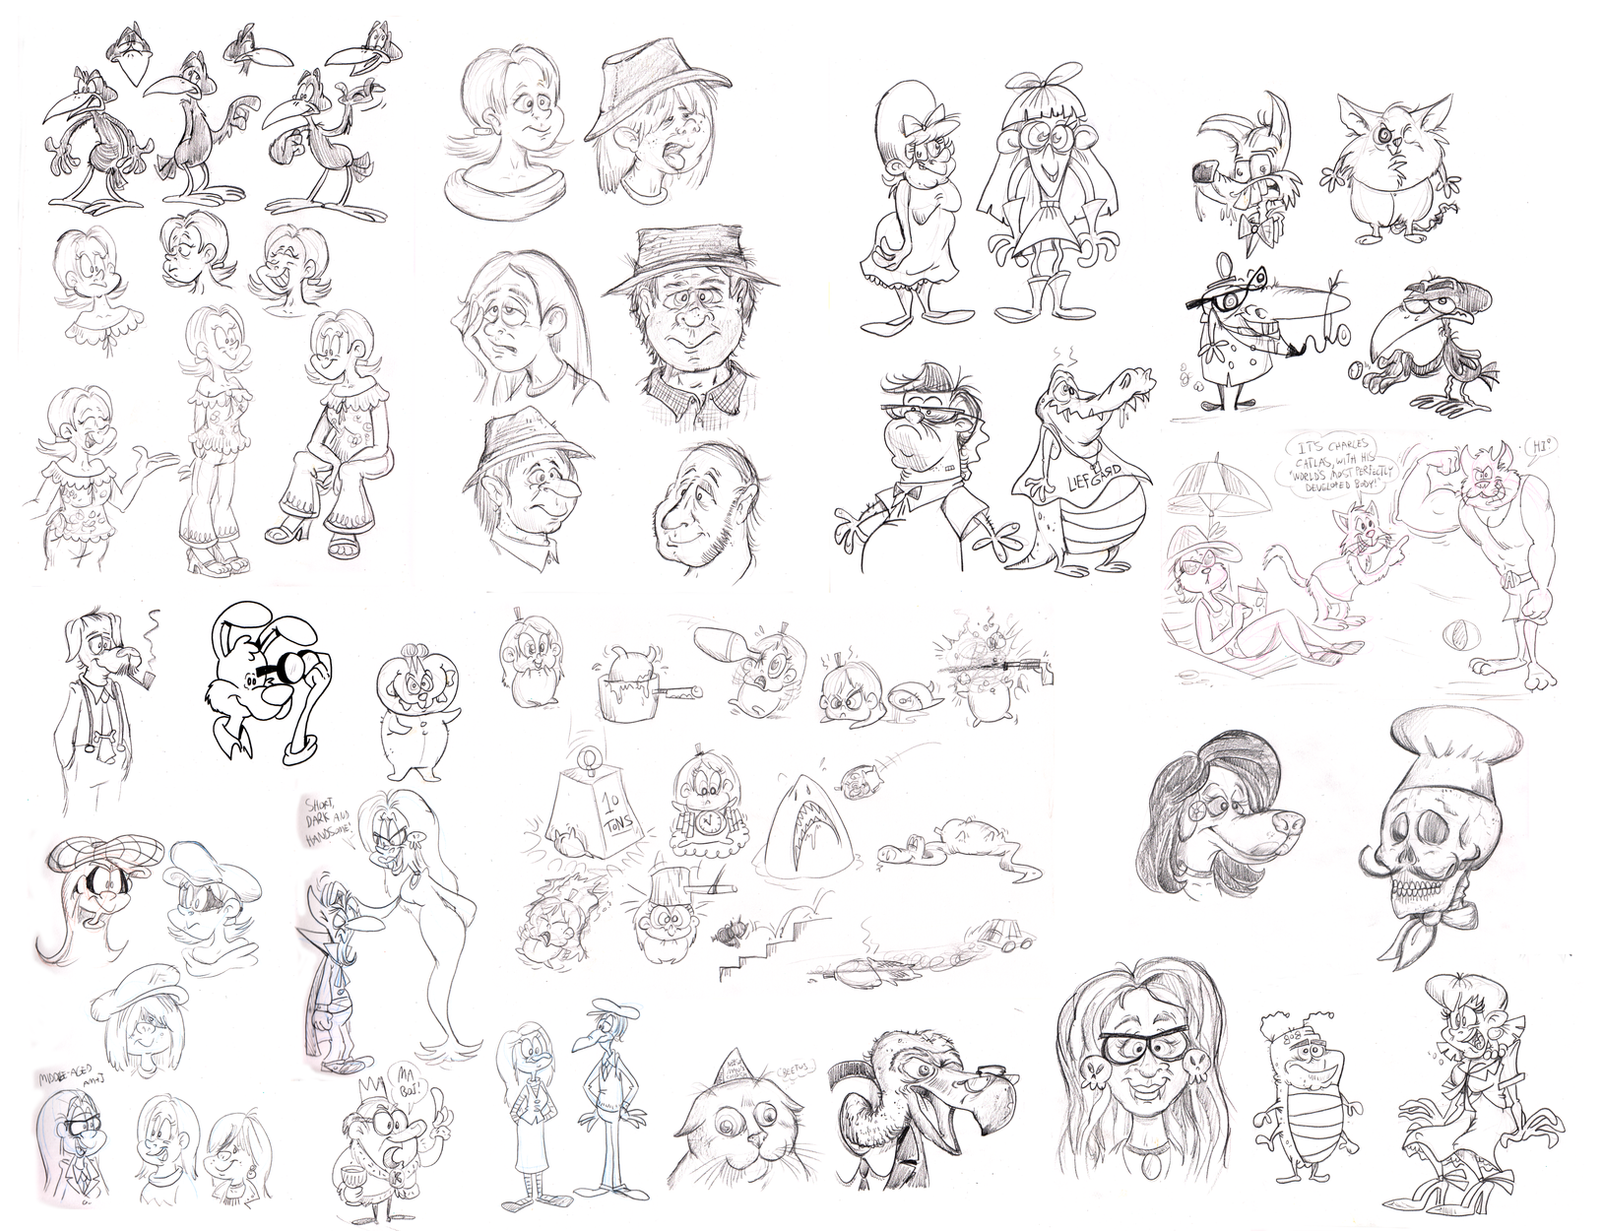 June Bug Sketch Sketch Dump Mid June by